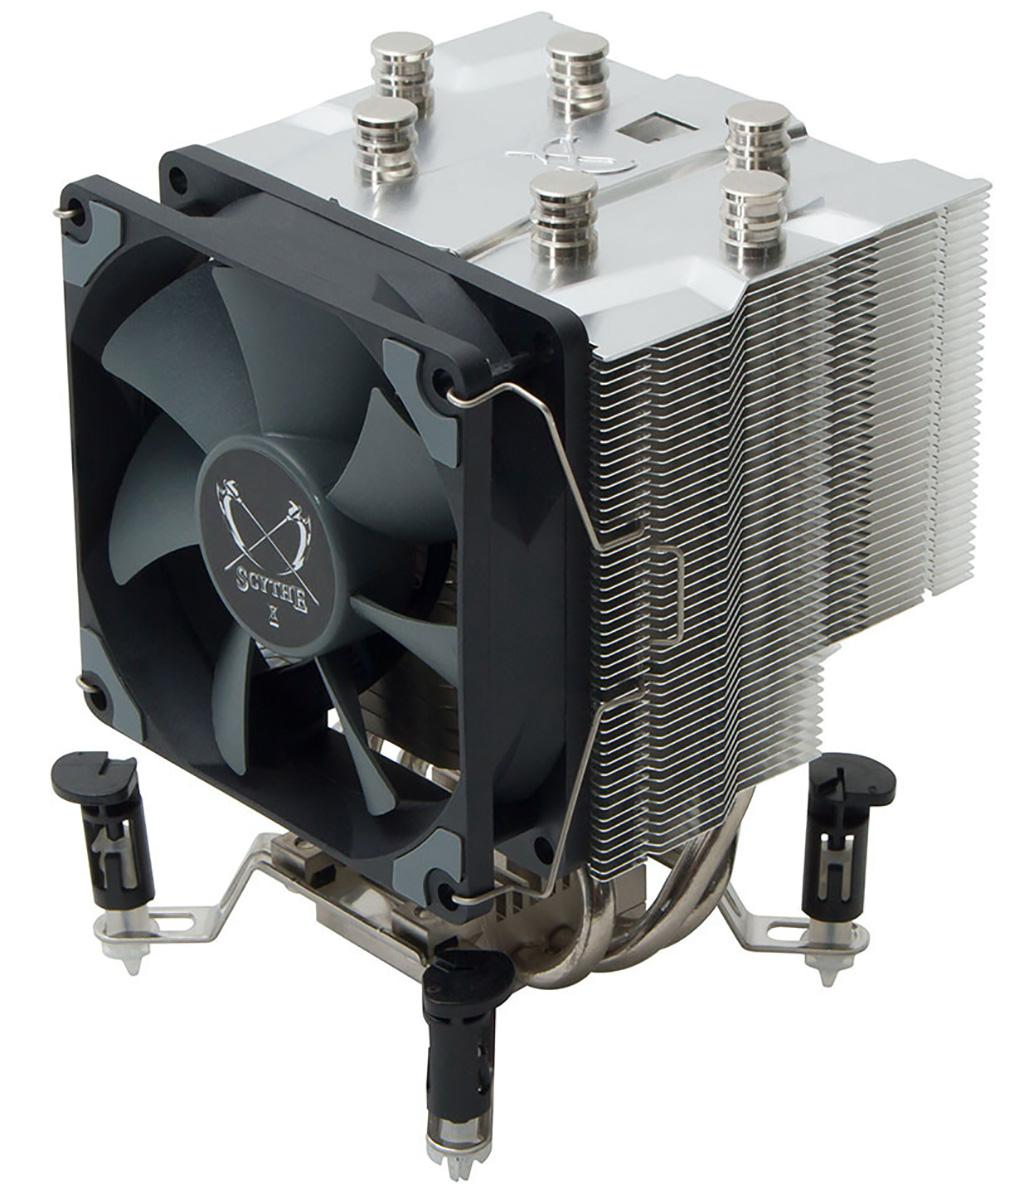 Начались продажи процессорного кулера Scythe Katana 5